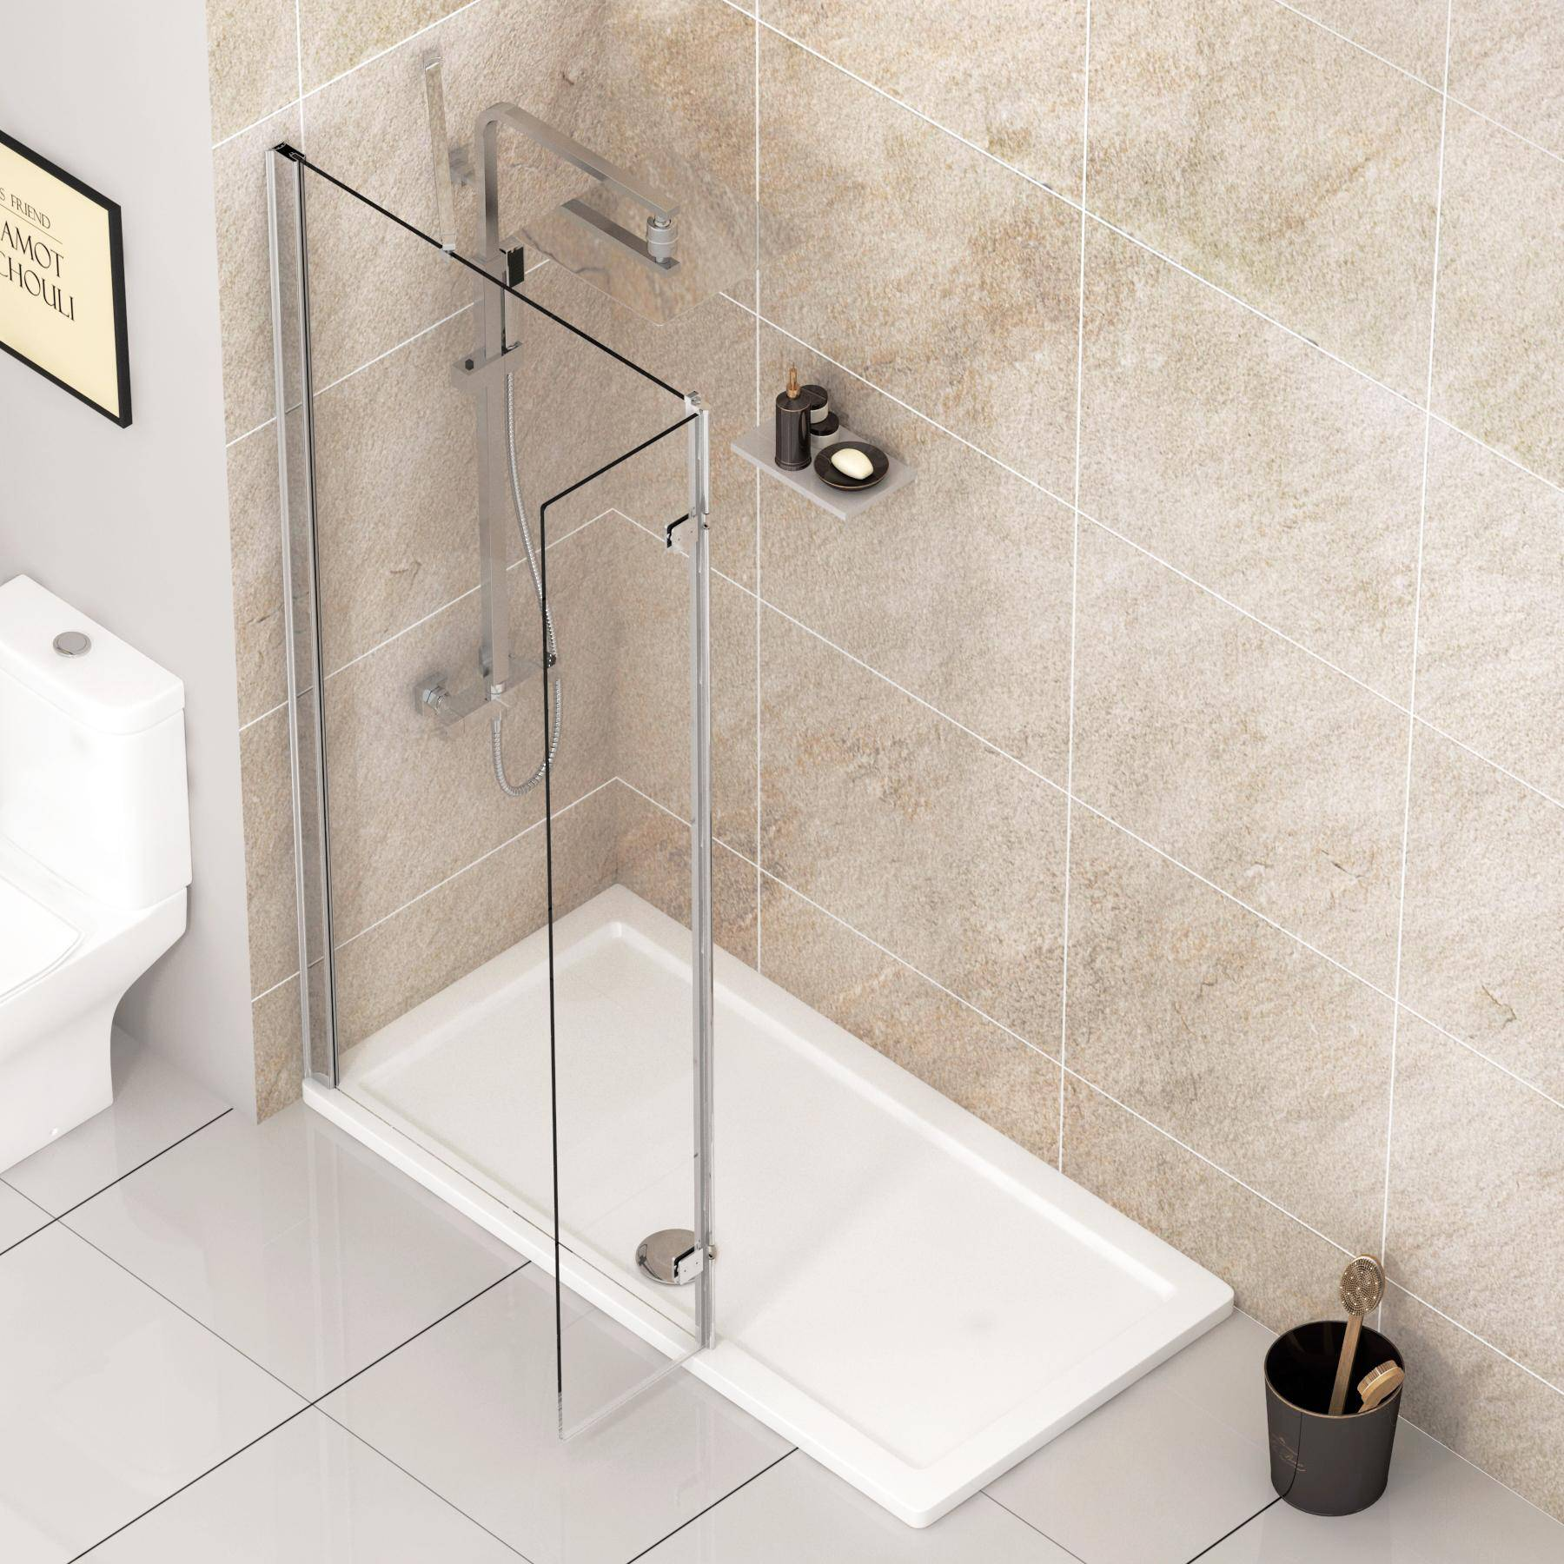 Royal Bathrooms 8mm Marbella 1100mm Wet Room Walk In Shower Screen + Flipper Panel - Easy Clean